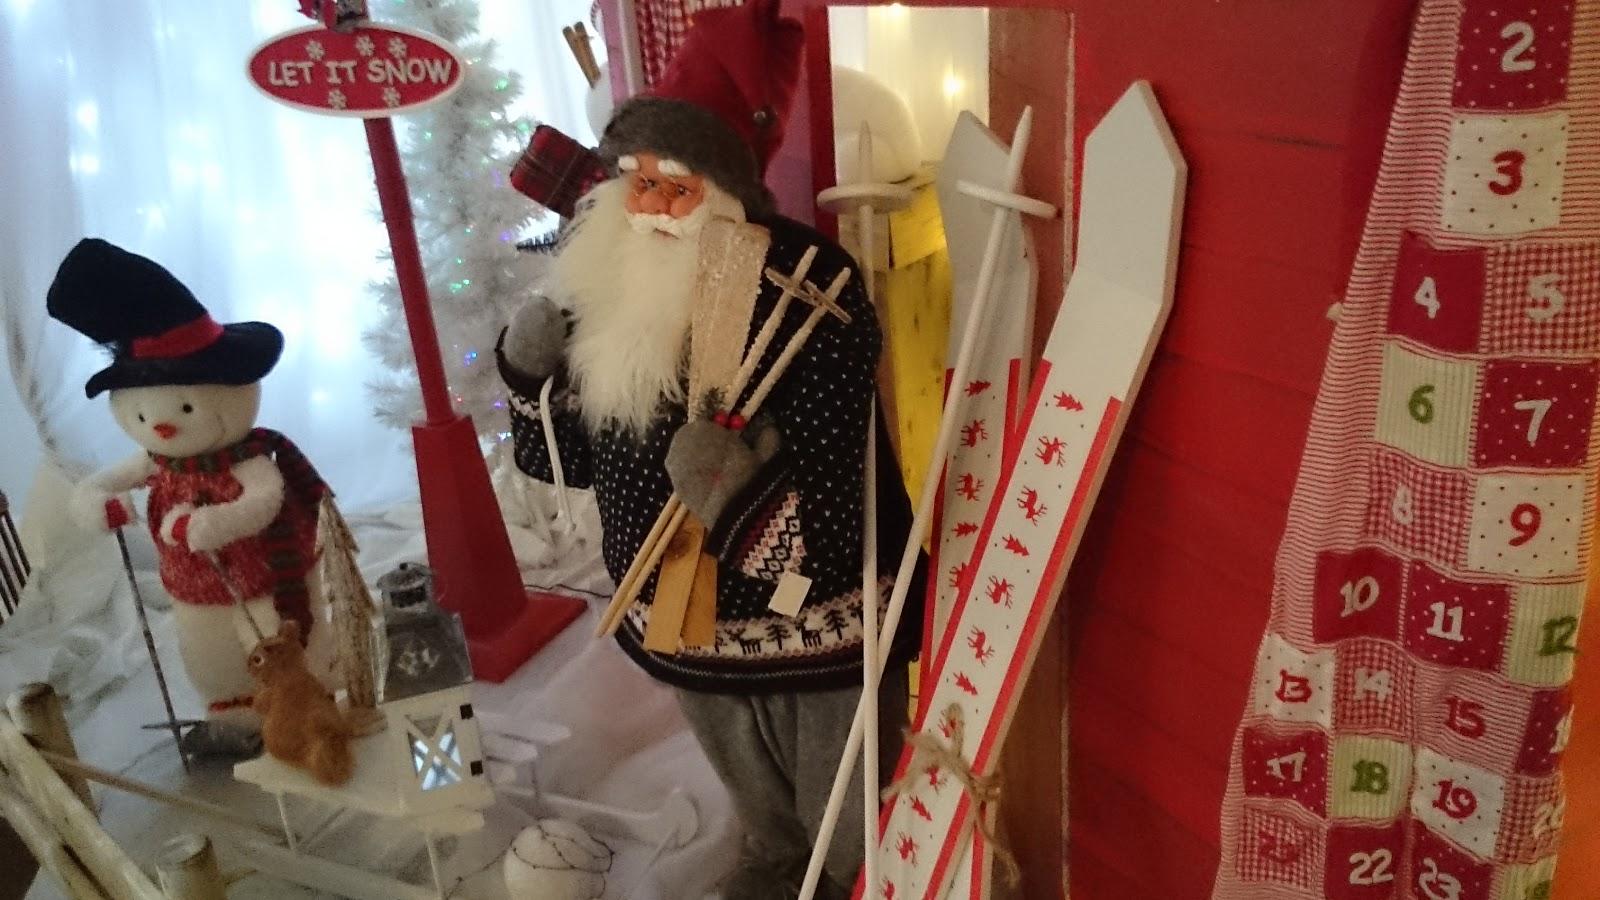 #A53126 Decor Noel Entreprises VITRINES NOEL: DECOR NOEL  5483 decorations de noel pour entreprise 1600x900 px @ aertt.com